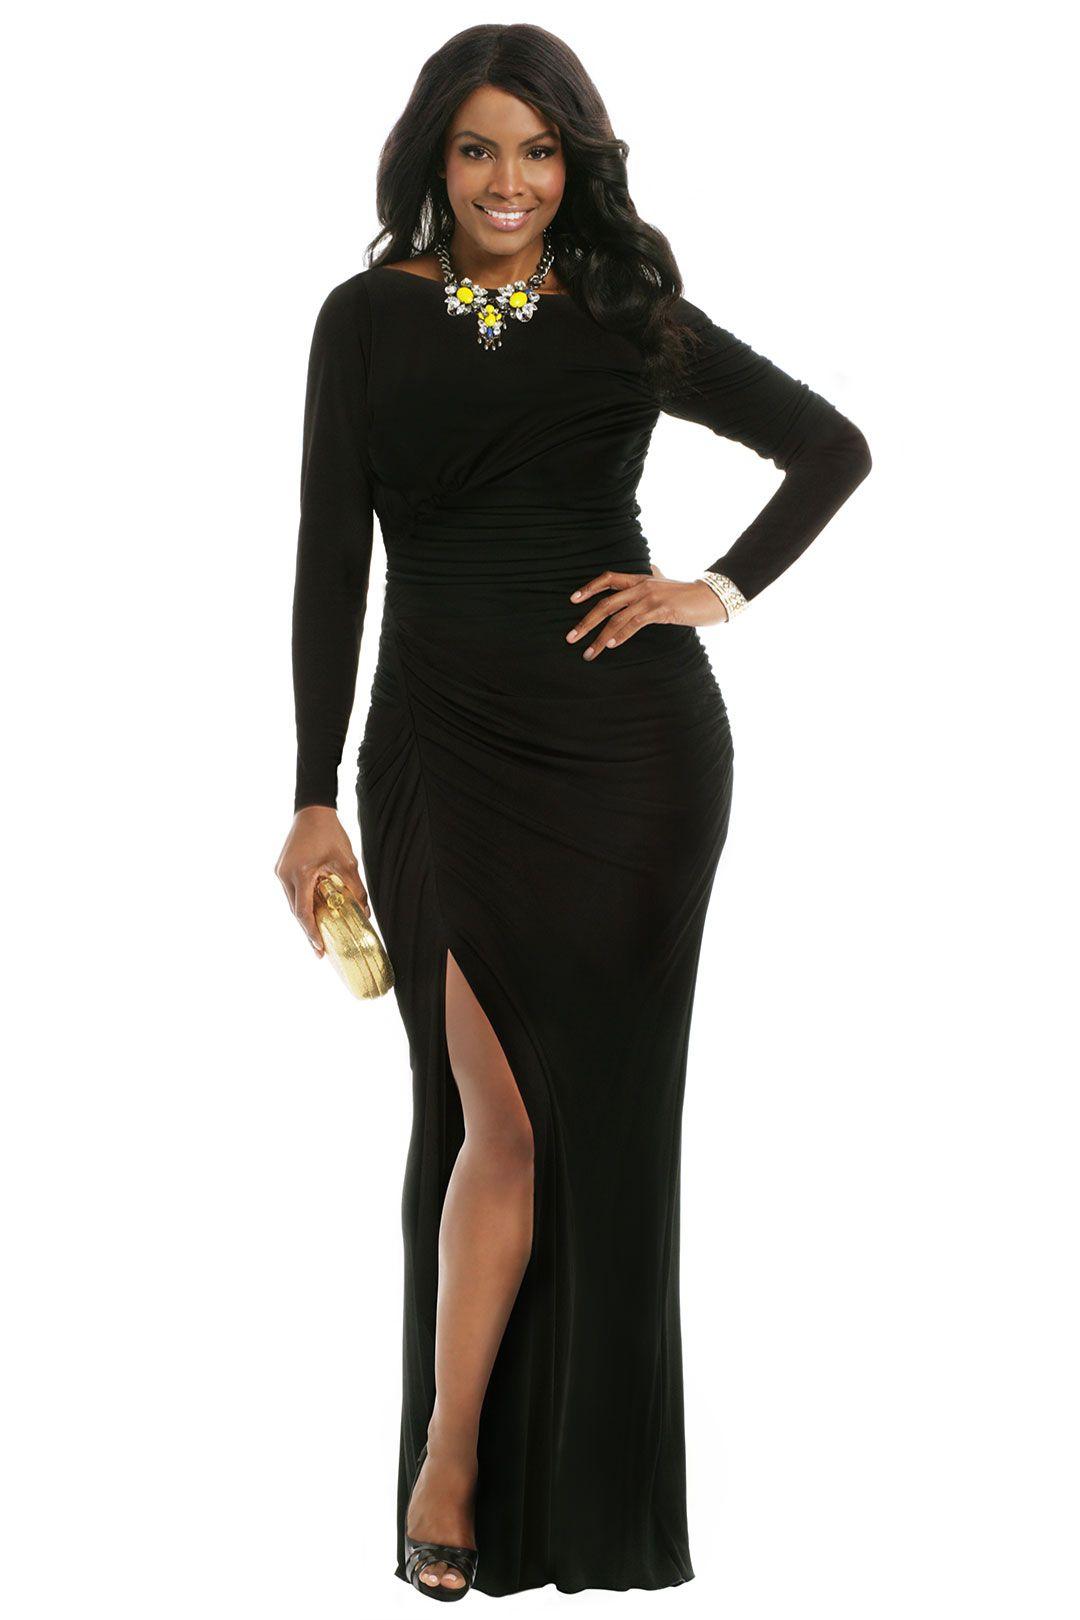 Badgley Mischka Black Sea Gown | Evening dresses, Evening ...